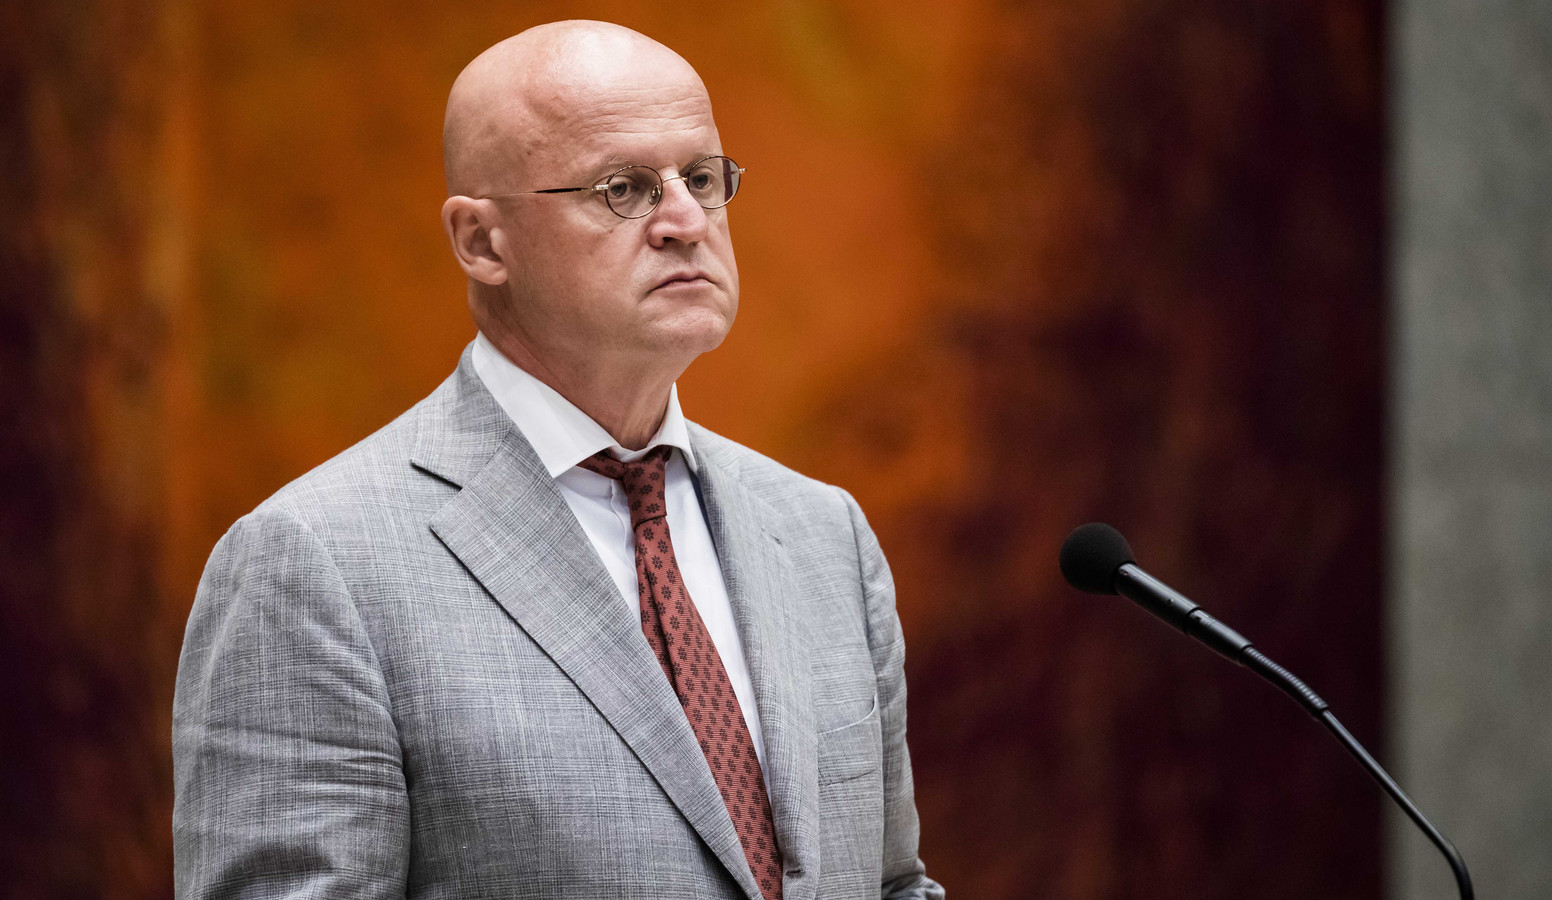 Minister Ferdinand Grapperhaus (Justitie en Veiligheid)